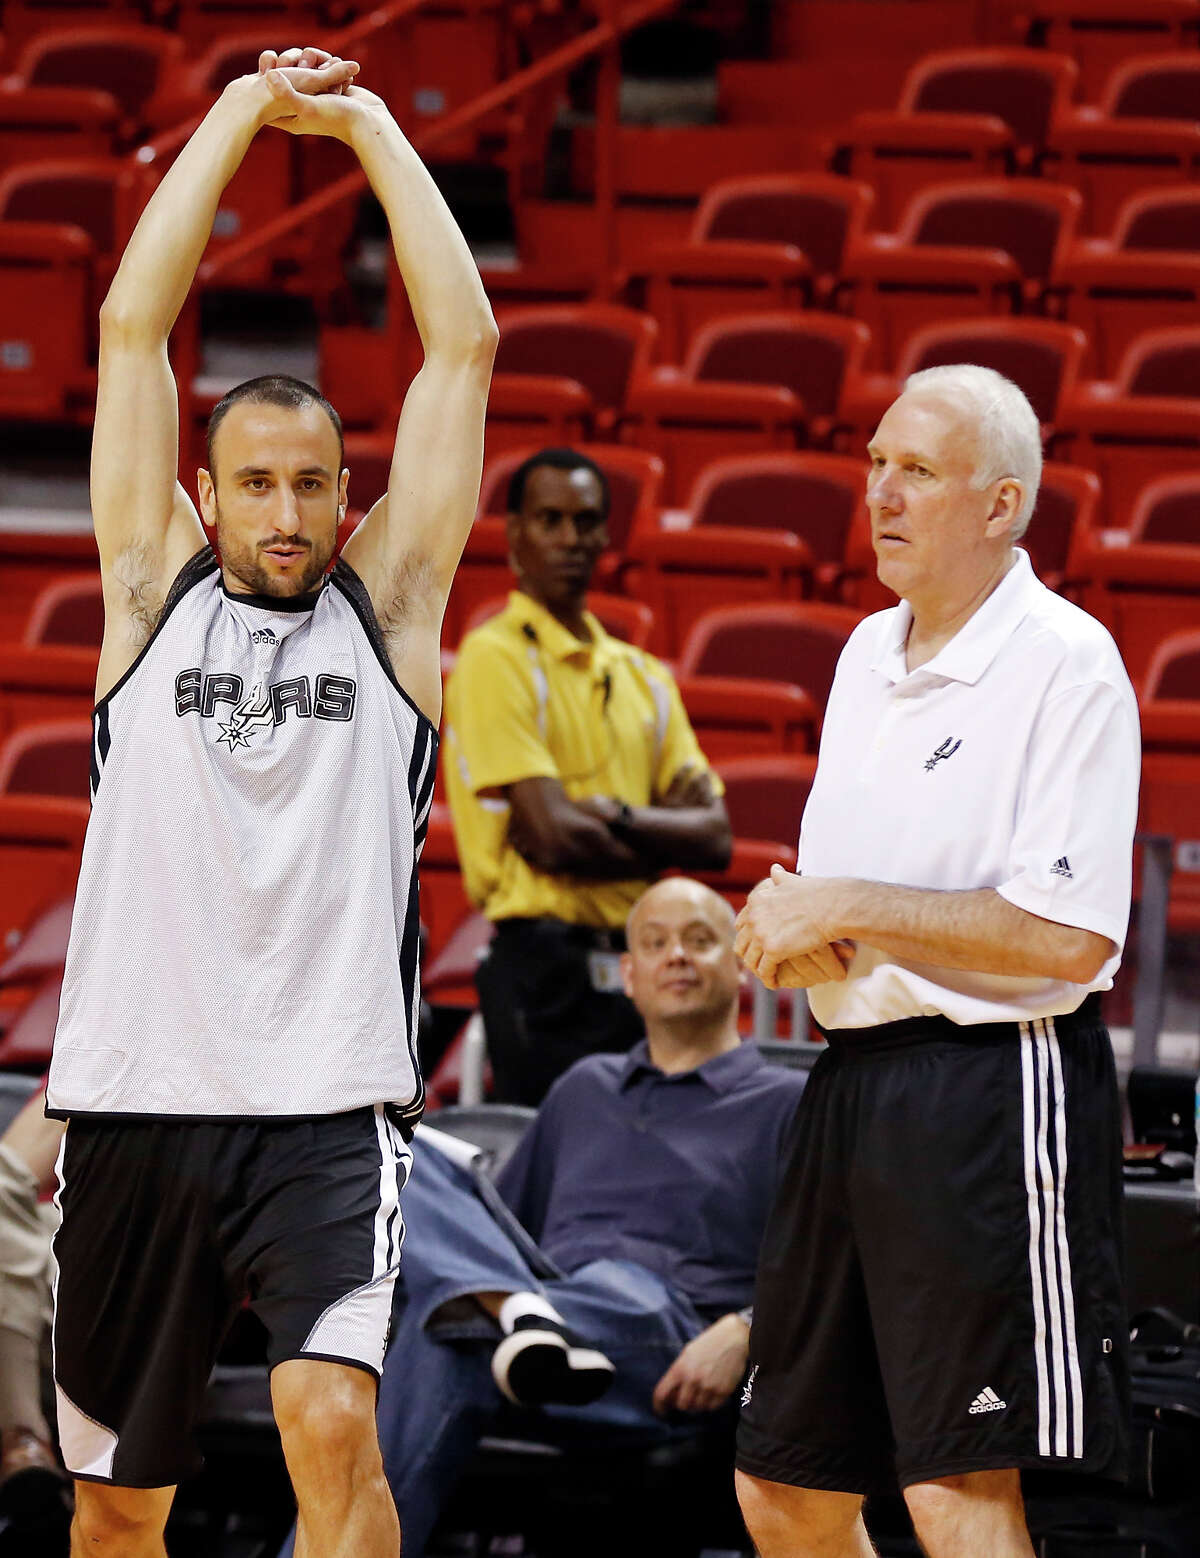 San Antonio Spurs' Manu Ginobili talks with San Antonio Spurs head coach Gregg Popovich during practice Saturday June 8, 2013 at American Airlines Arena in Miami, Fla.